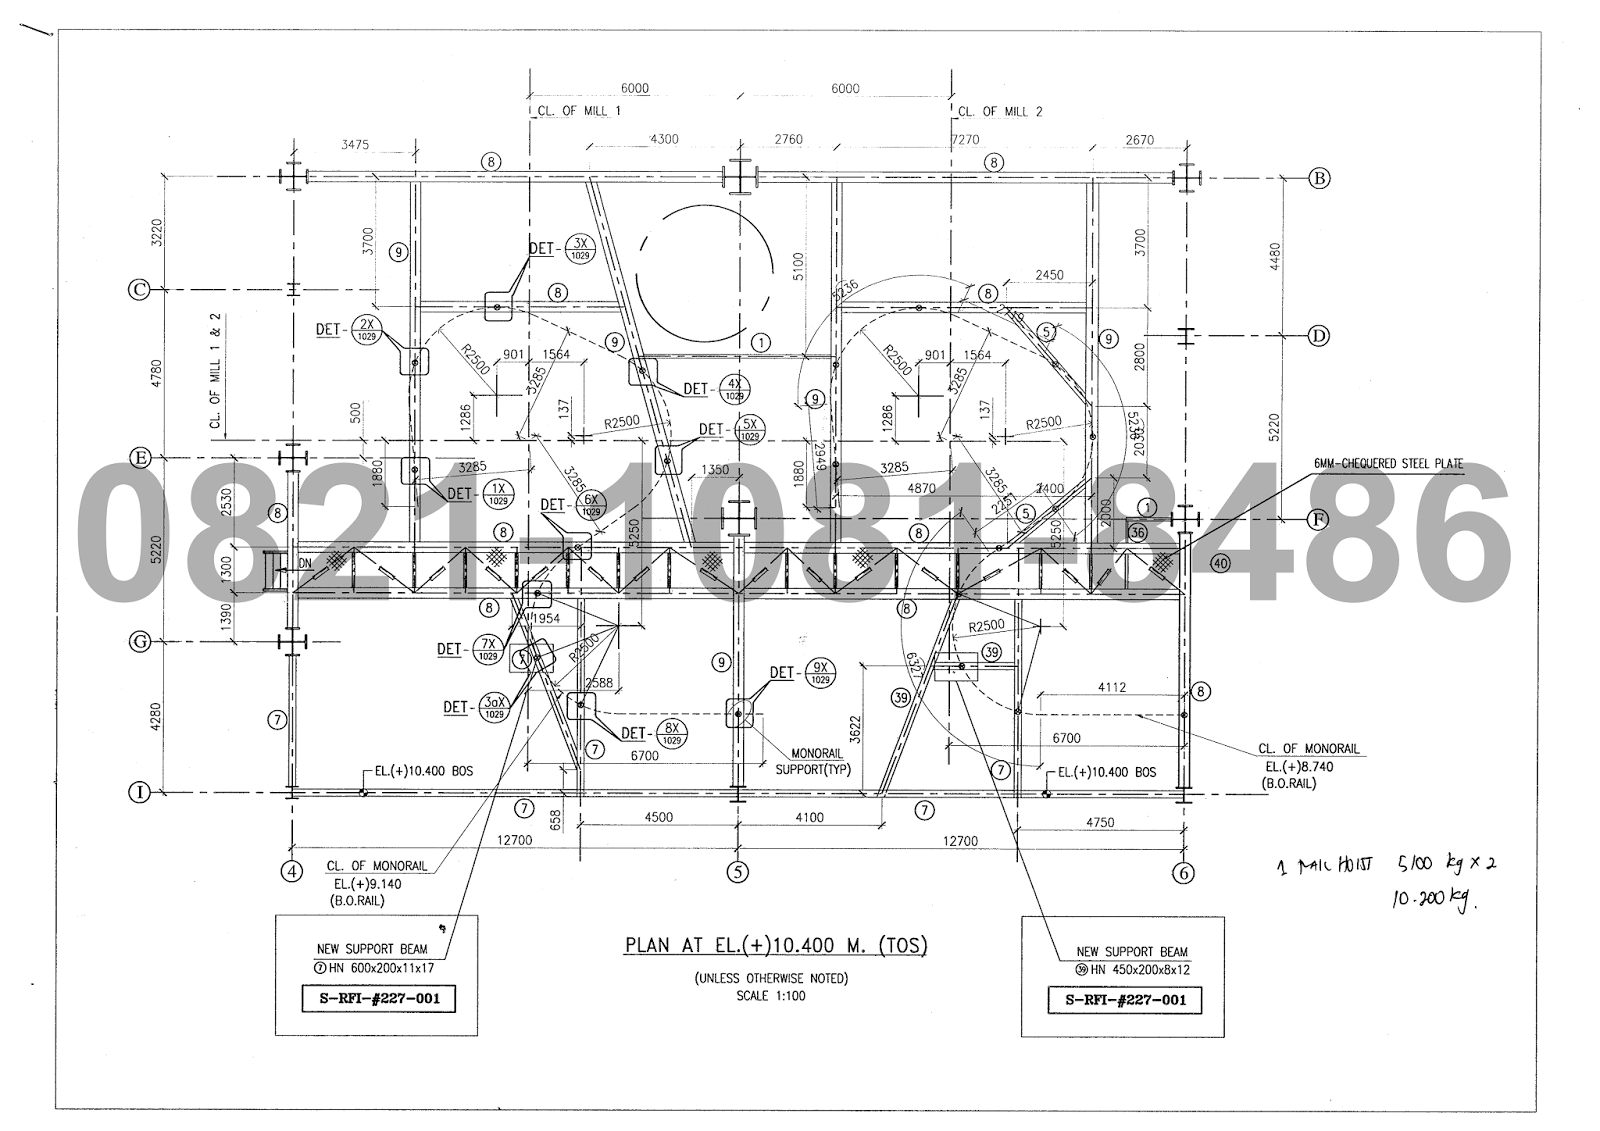 vw buggy wiring diagram 1600  diagram  auto wiring diagram